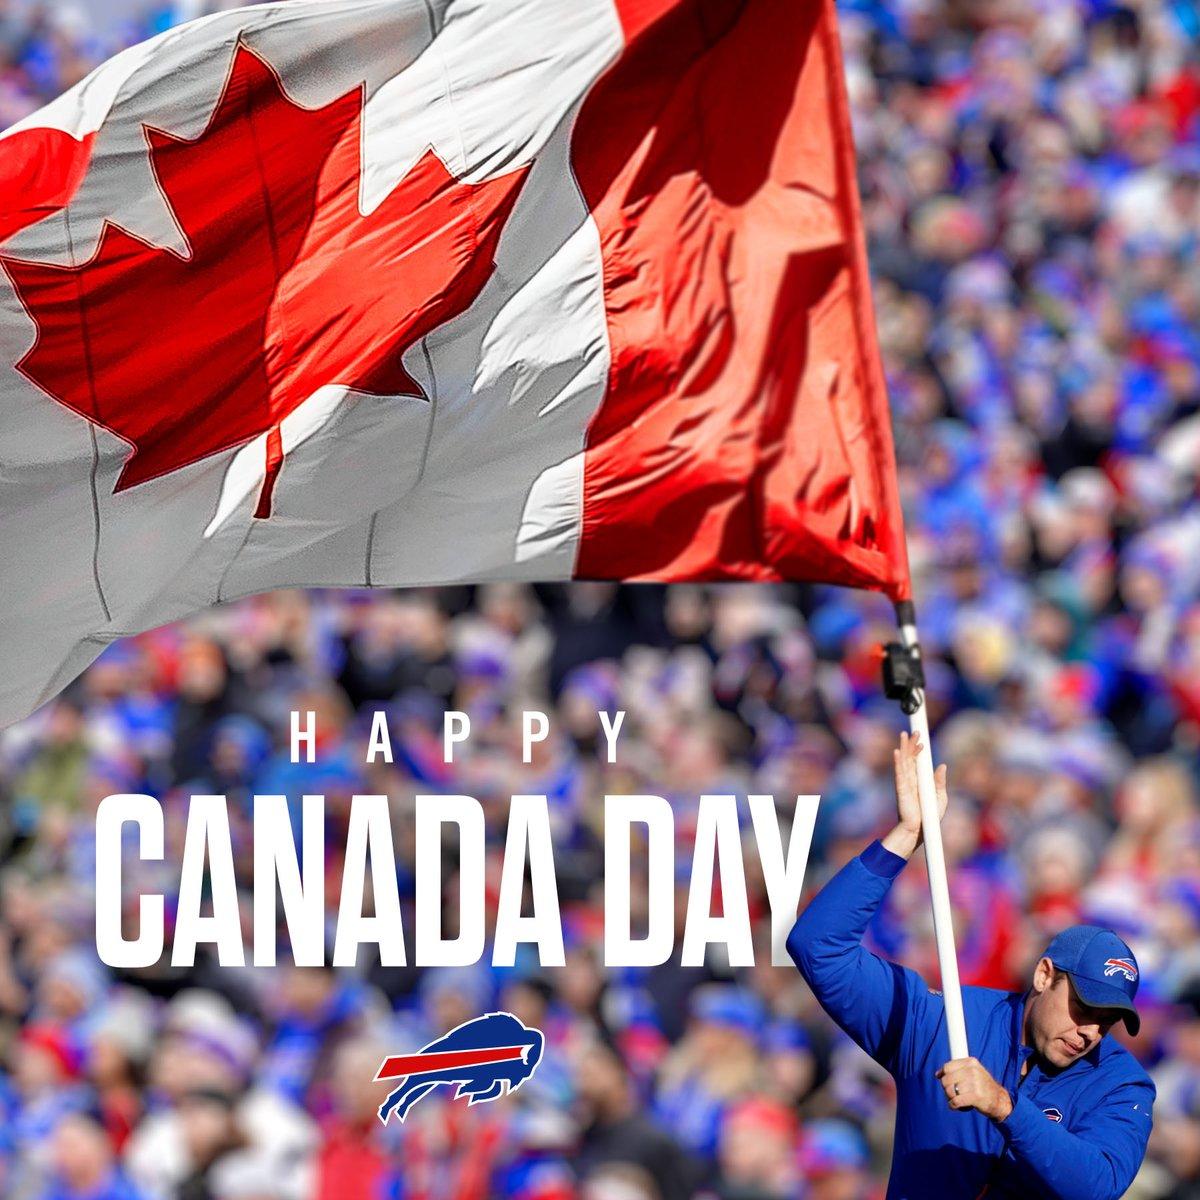 Happy #CanadaDay to our neighbours up North! 🇨🇦  #GoBills | #BillsMafia https://t.co/Bveb3oL5yv